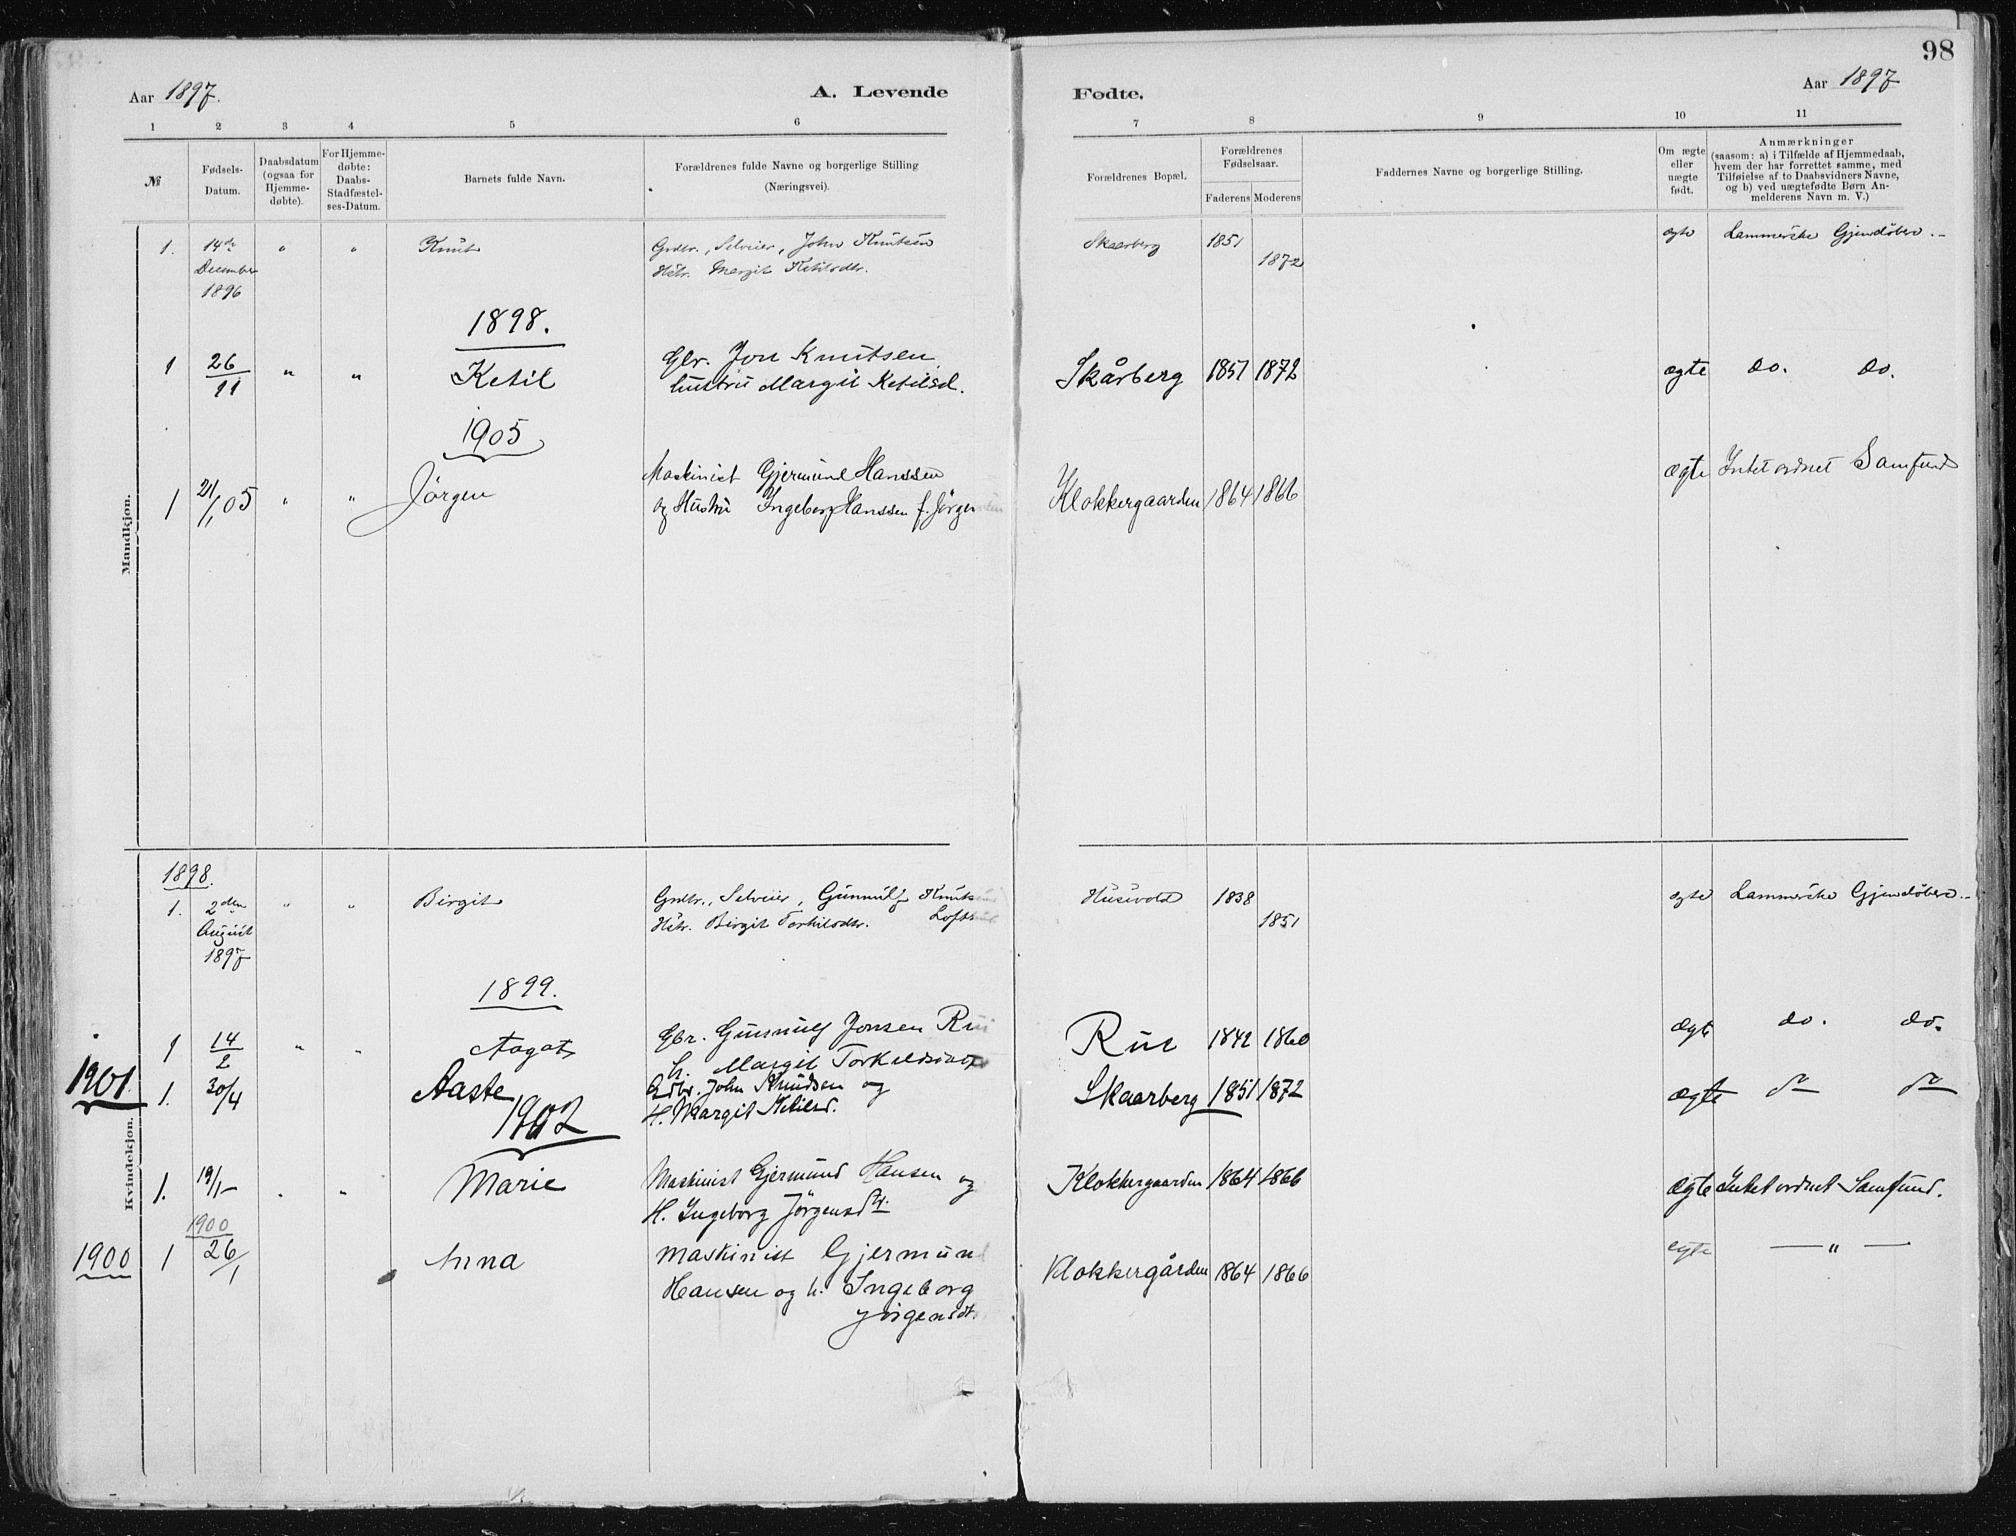 SAKO, Tinn kirkebøker, F/Fa/L0007: Ministerialbok nr. I 7, 1878-1922, s. 98